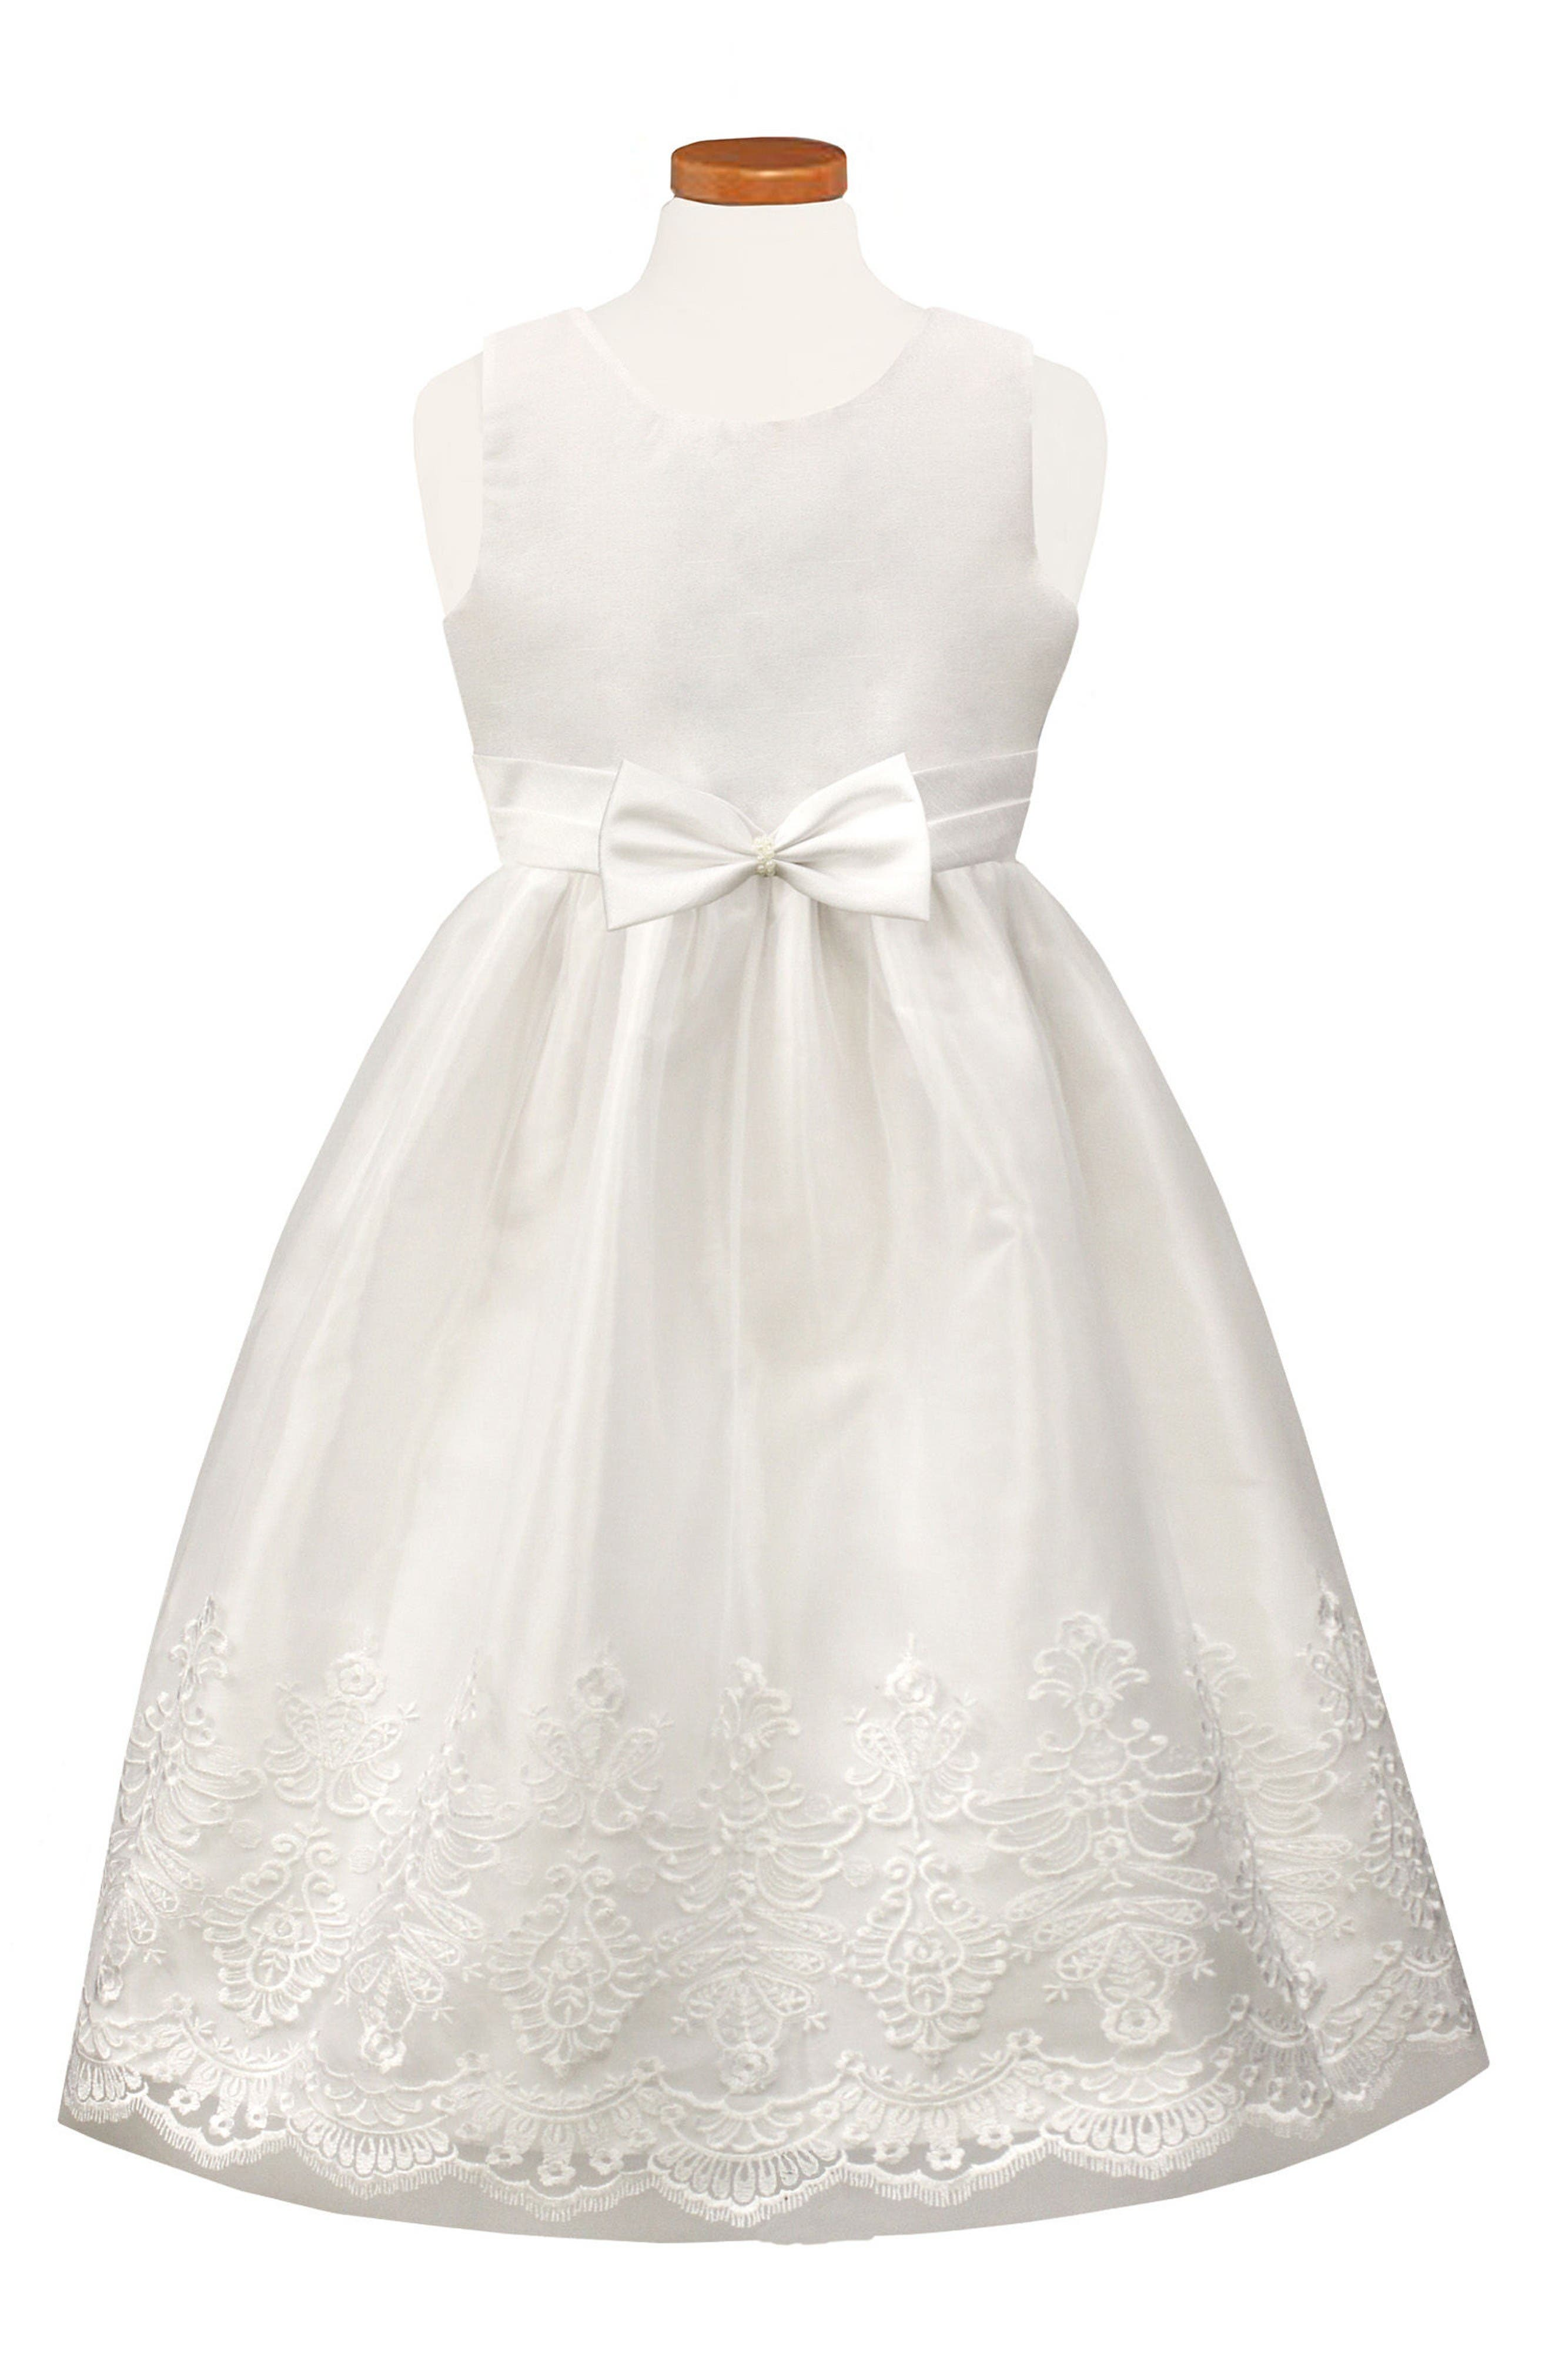 Alternate Image 1 Selected - Sorbet Embroidered Tulle Dress (Big Girls)